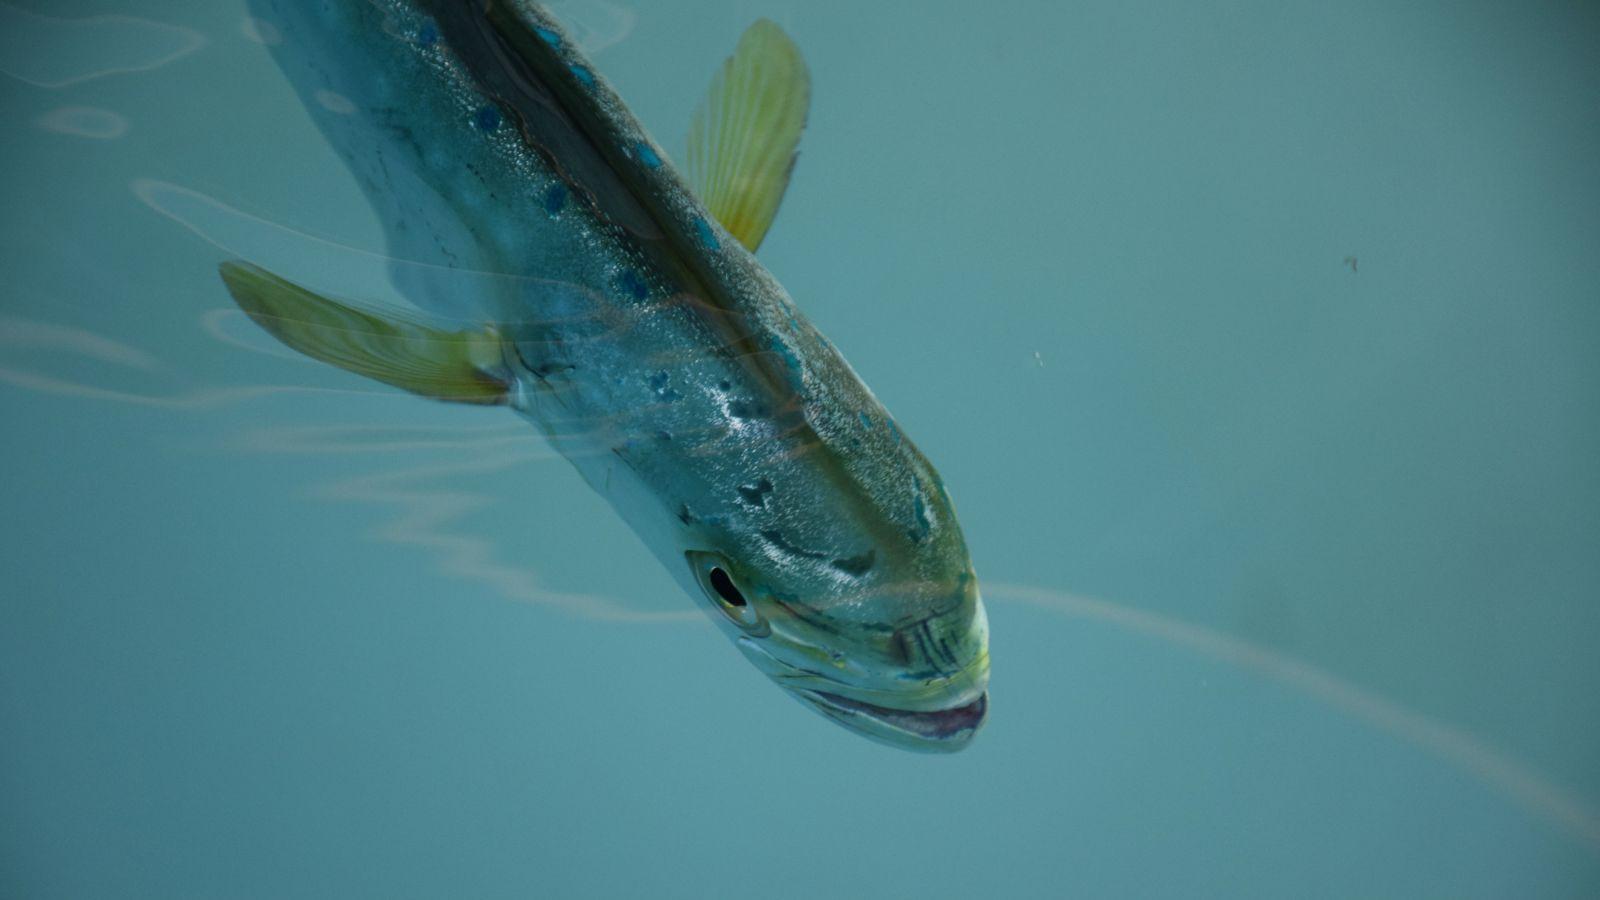 Mahi deepwater horizon, effect deepwater horizon on fish, fish kill deepwater horizon